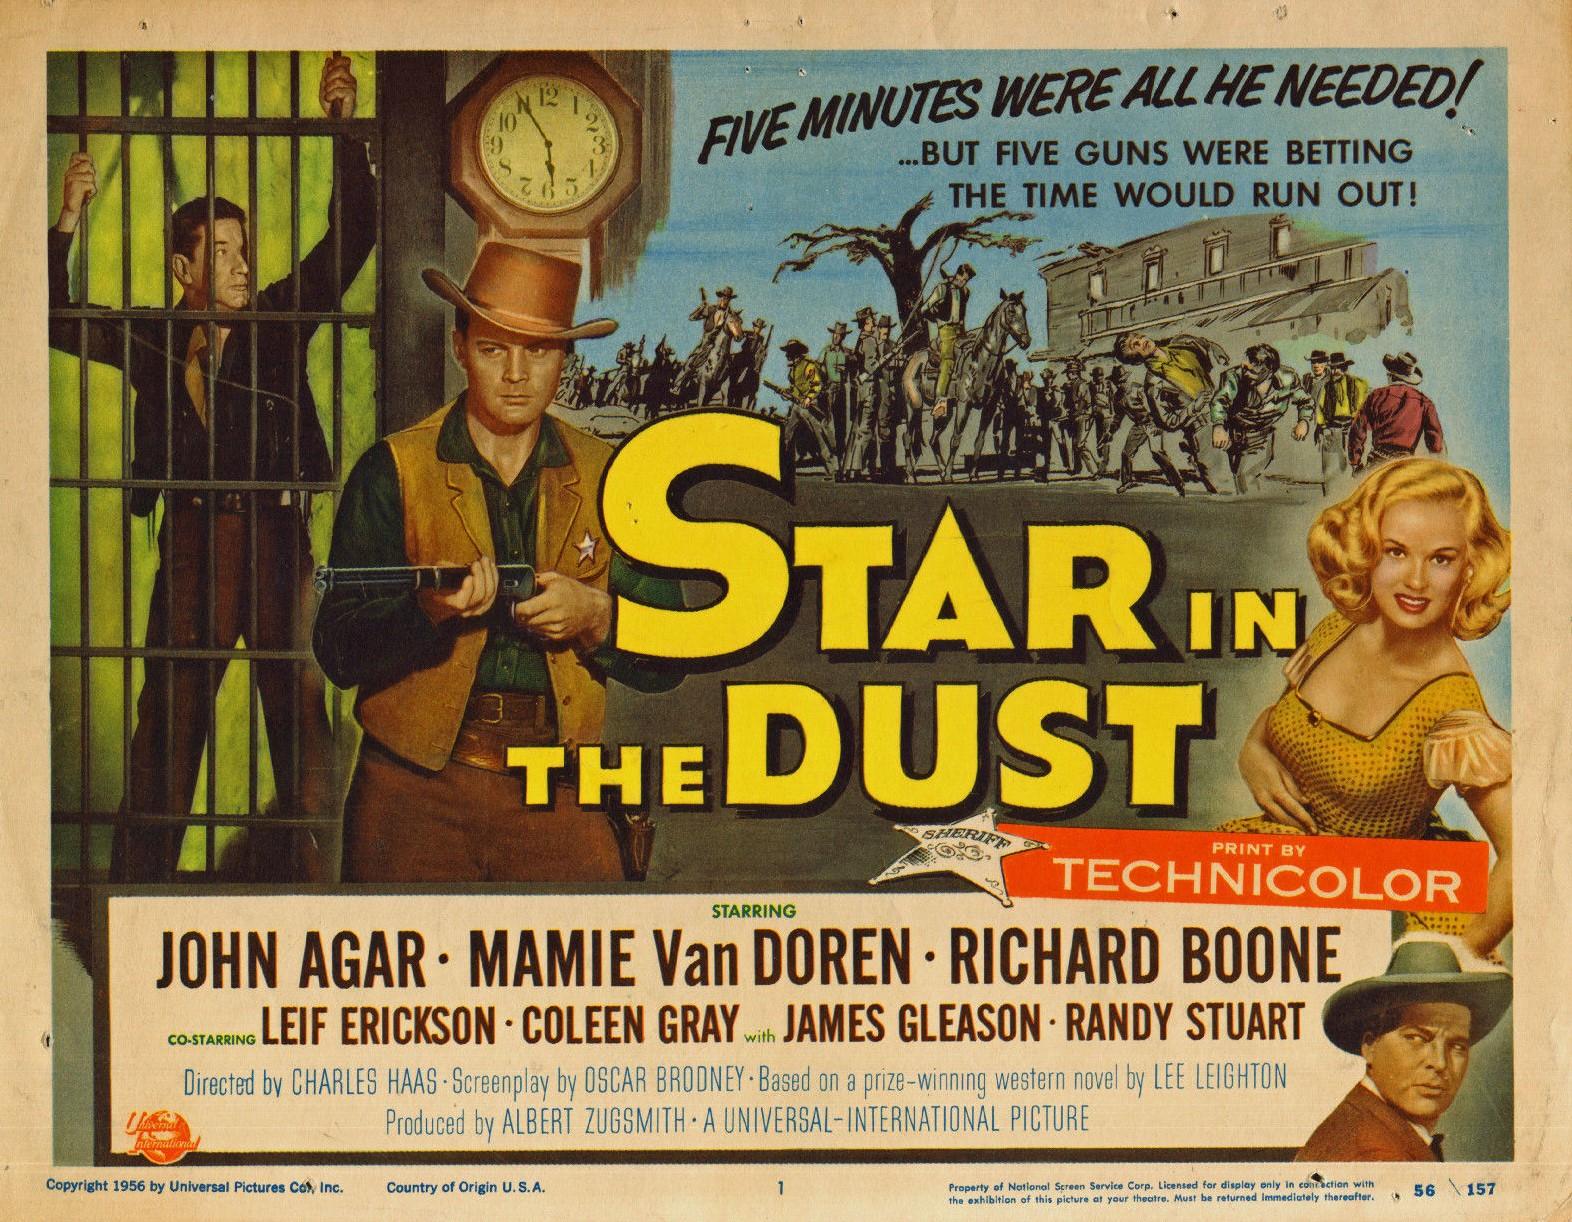 John Agar, Leif Erickson, Richard Boone, and Mamie Van Doren in Star in the Dust (1956)